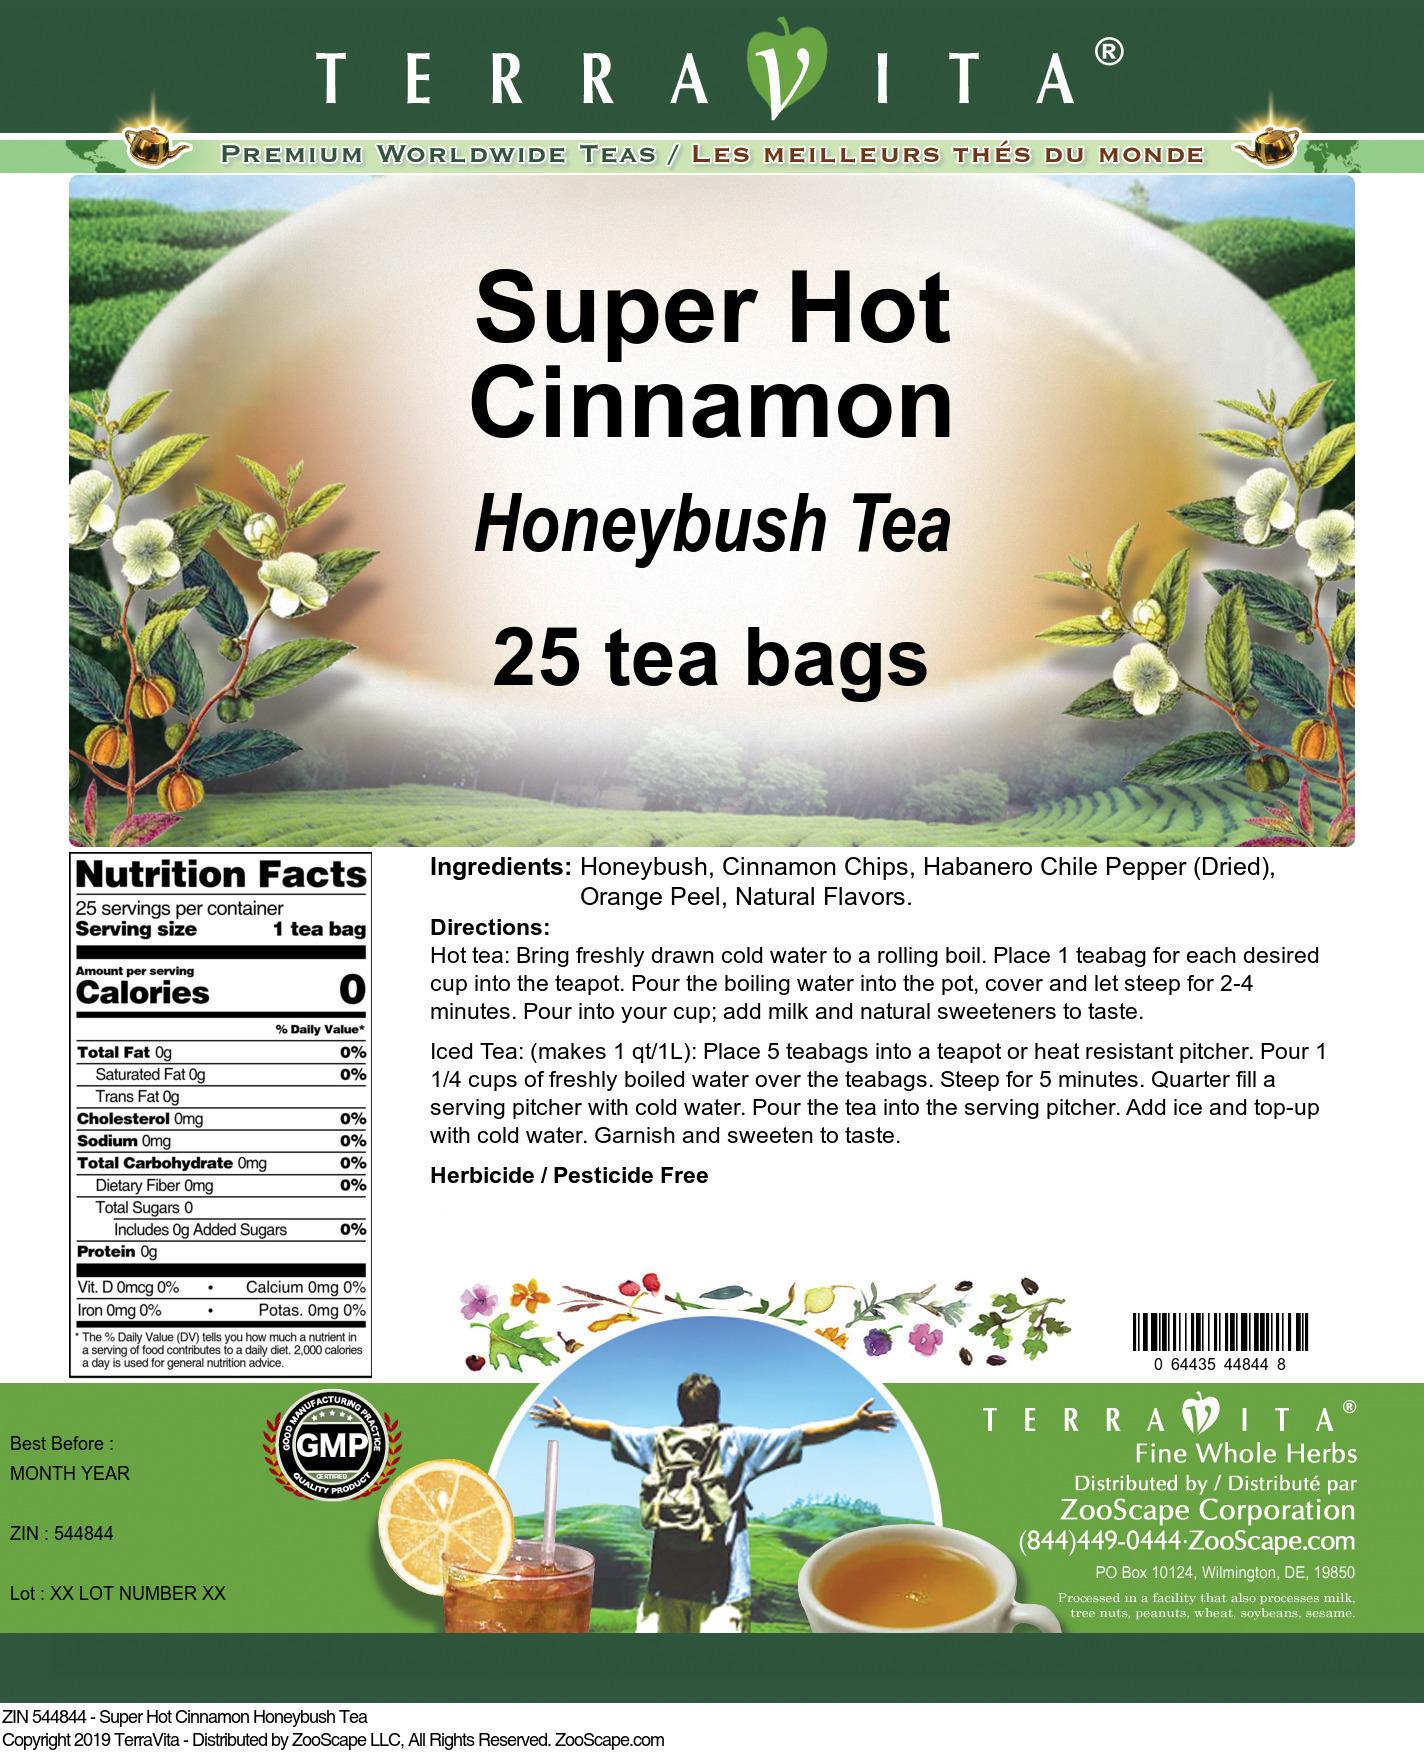 Super Hot Cinnamon Honeybush Tea